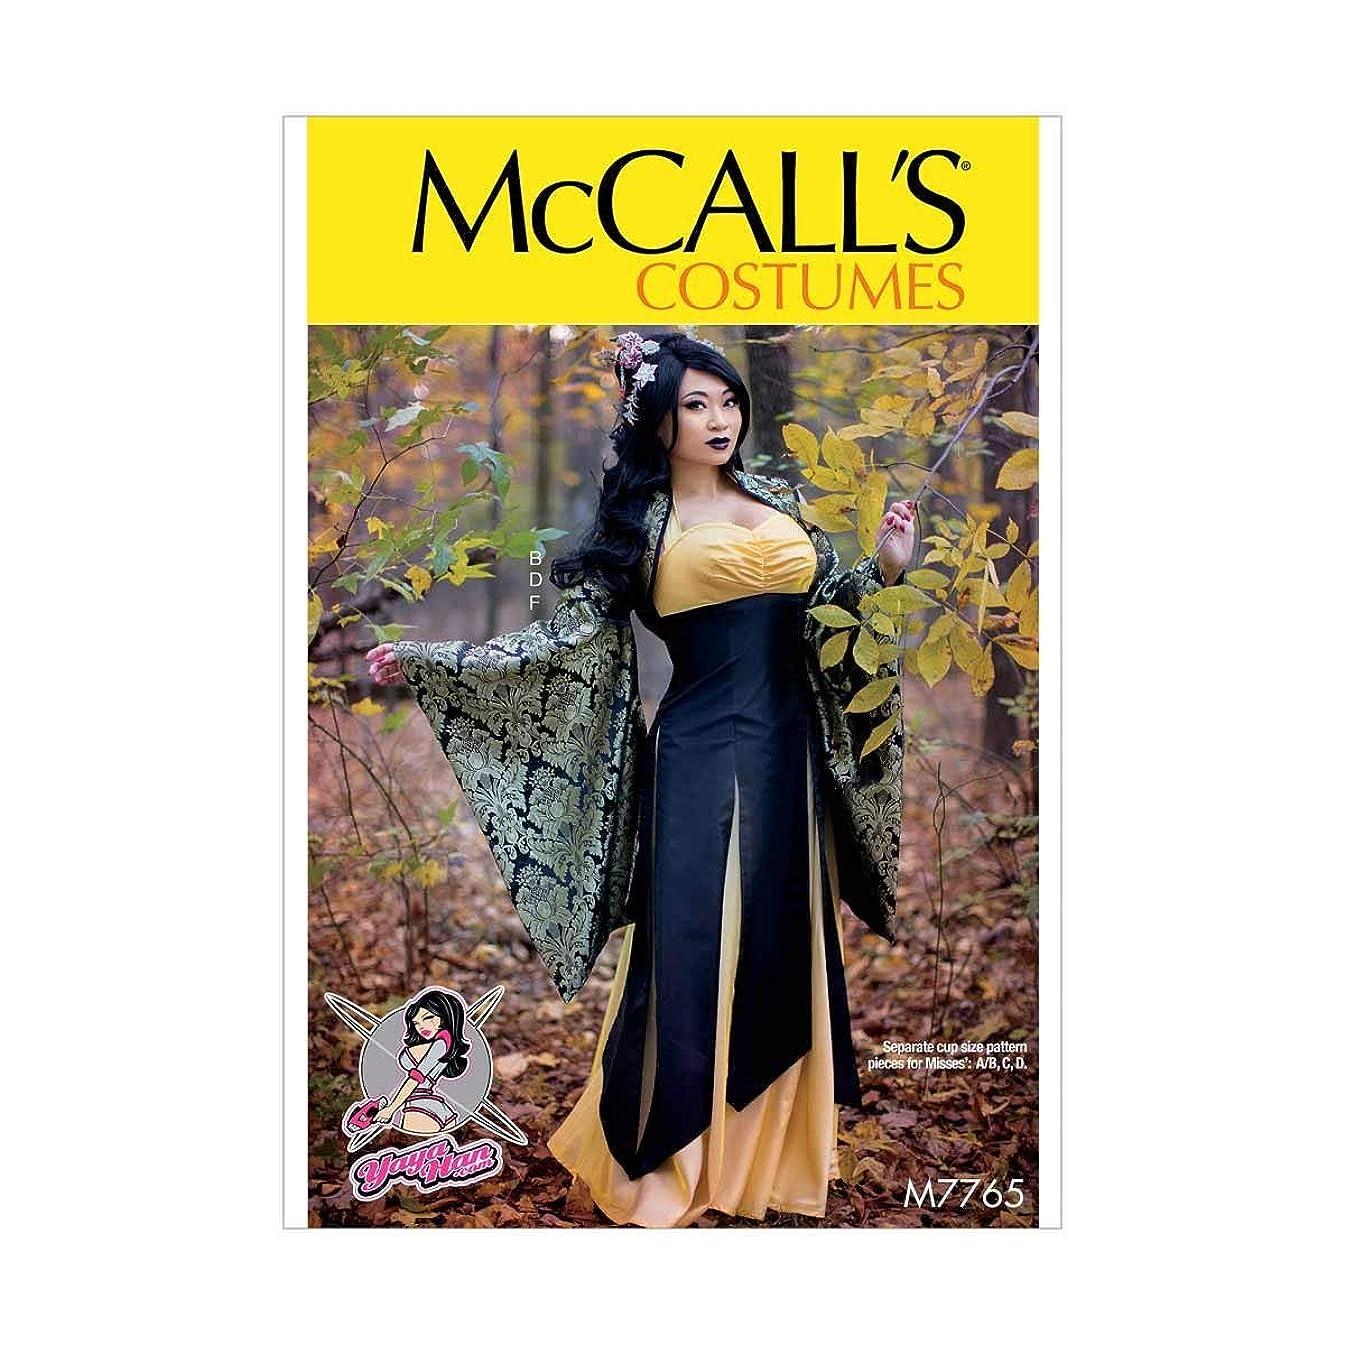 McCall's Patterns M7765E50 Misses' Boleros, Dresses, and Skirts